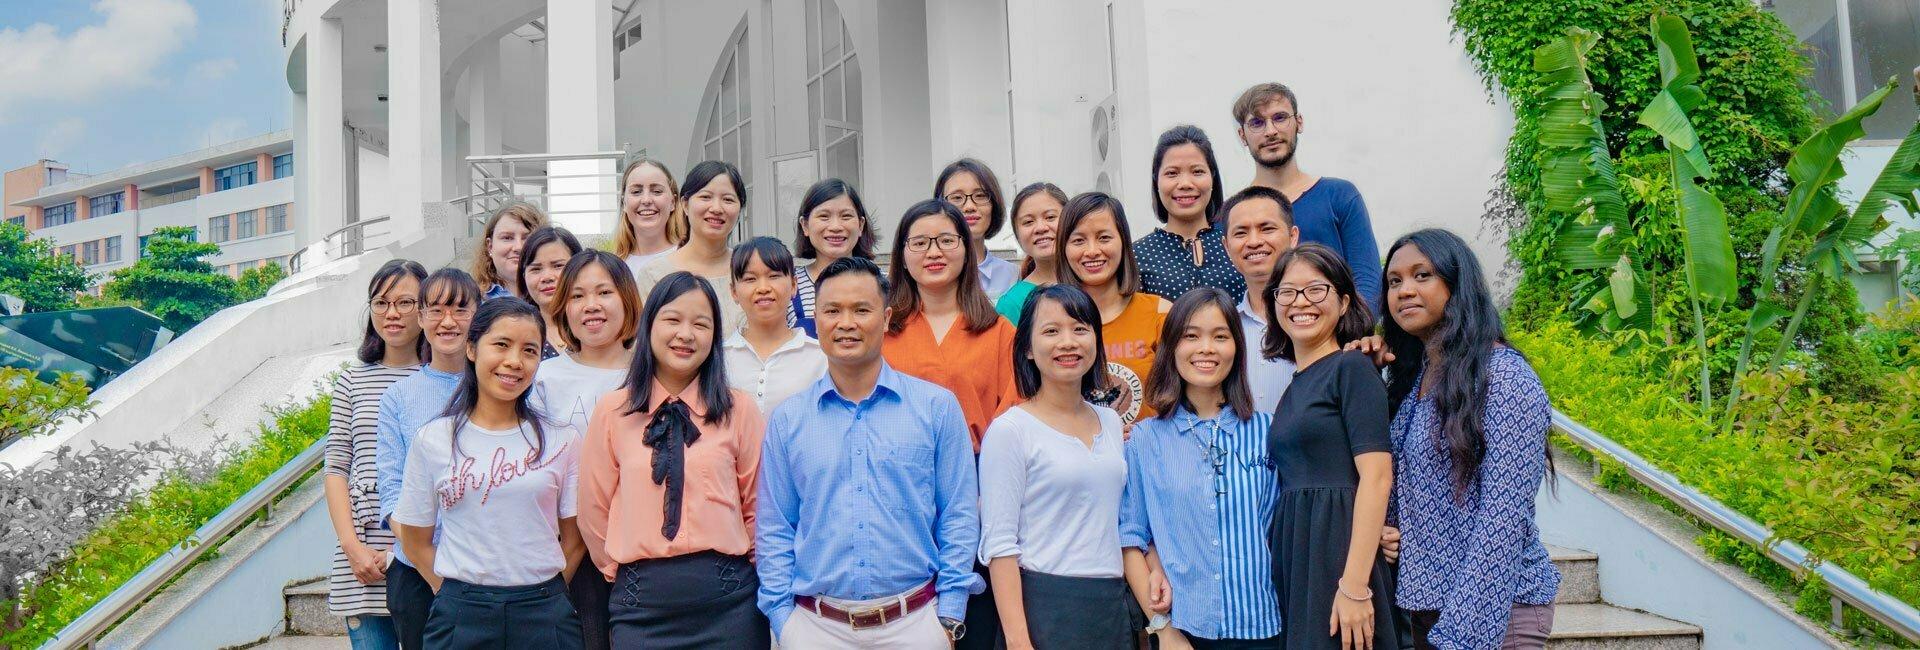 Hanoi Voyages | Agence de voyage sur mesure